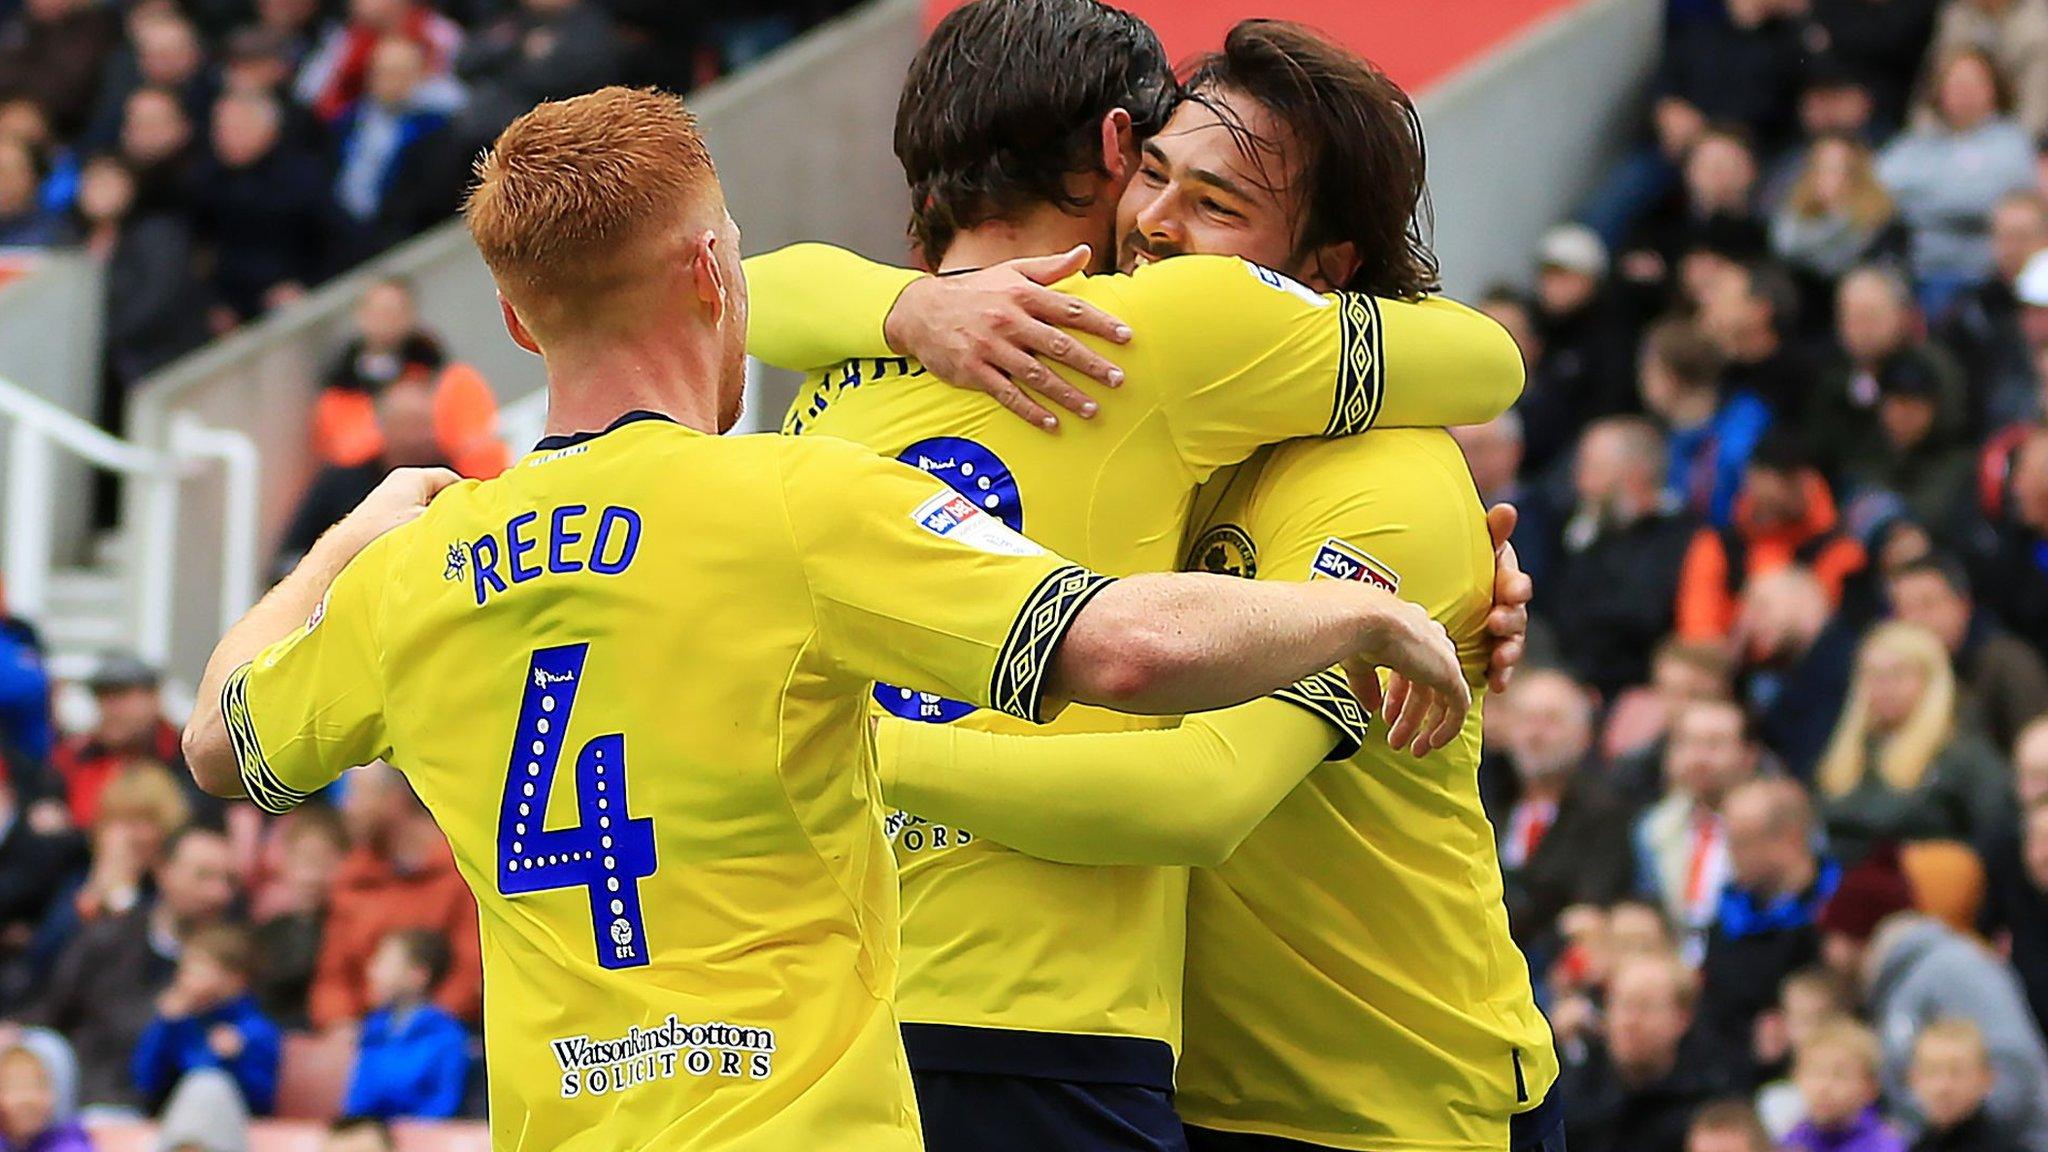 Stoke City 2-3 Blackburn: Saido Berahino misses late penalty as Potters' fightback falls short